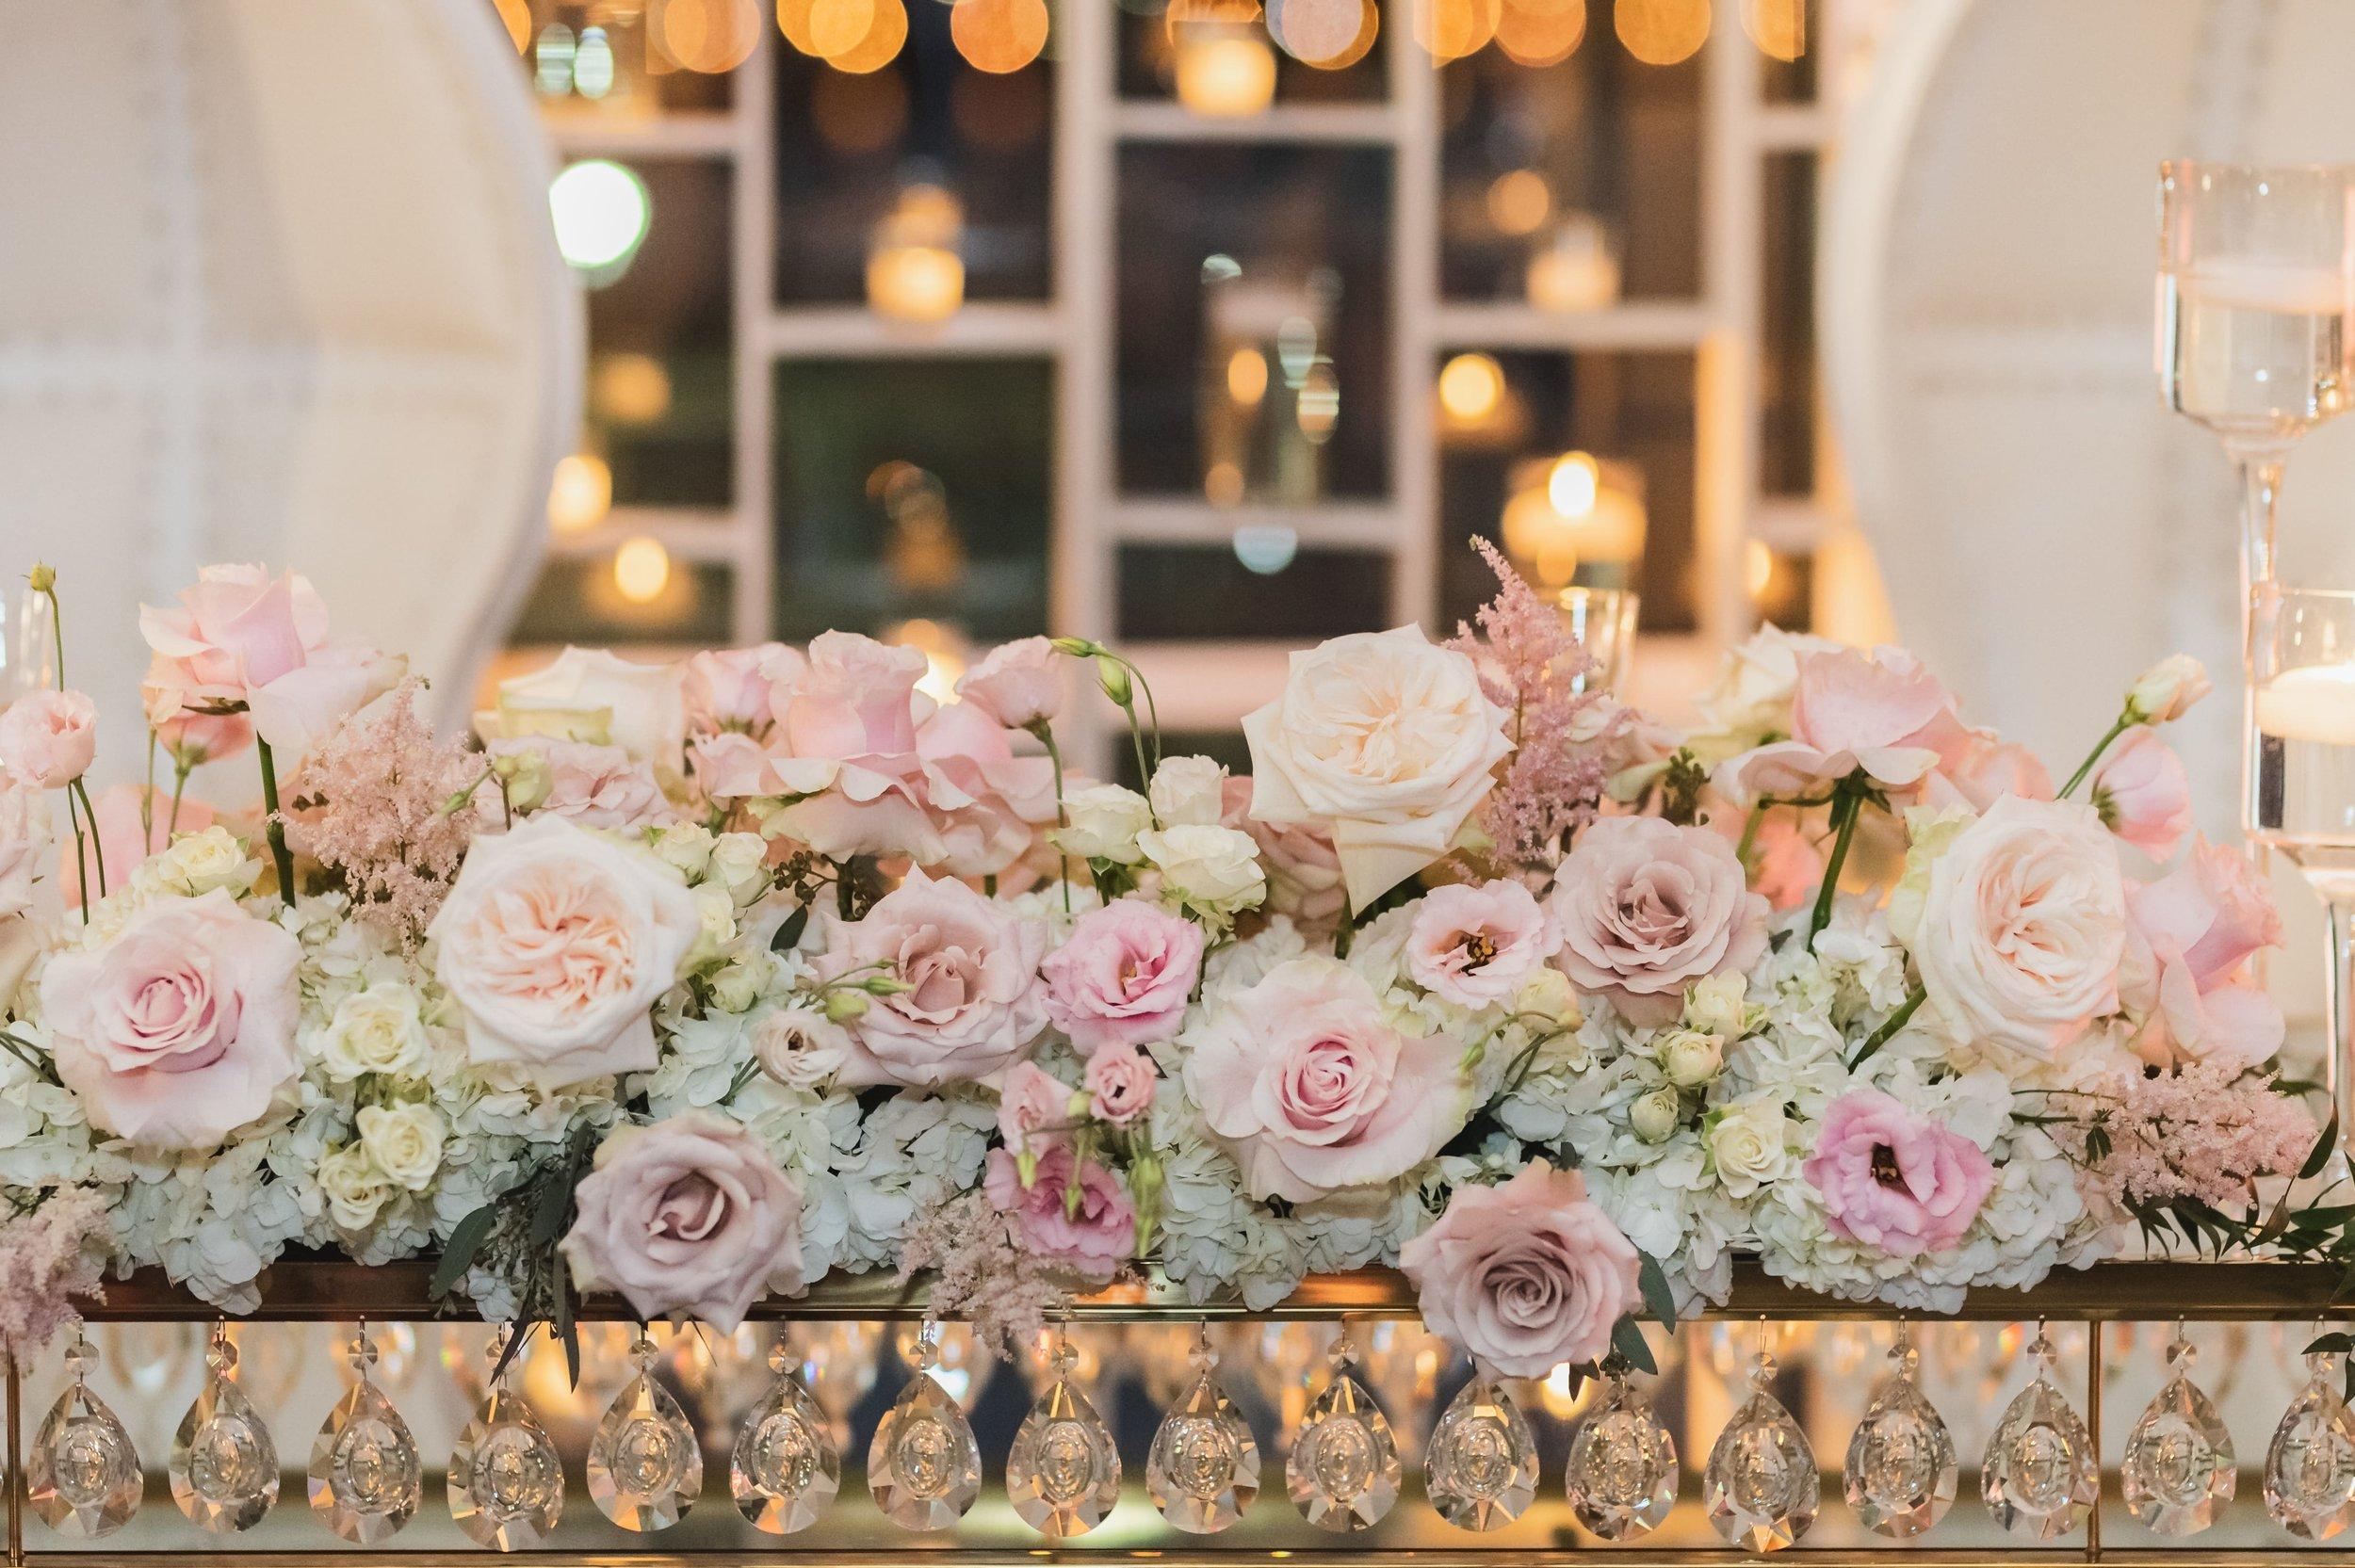 Summer Wedding Trends 2019 - Pink roses